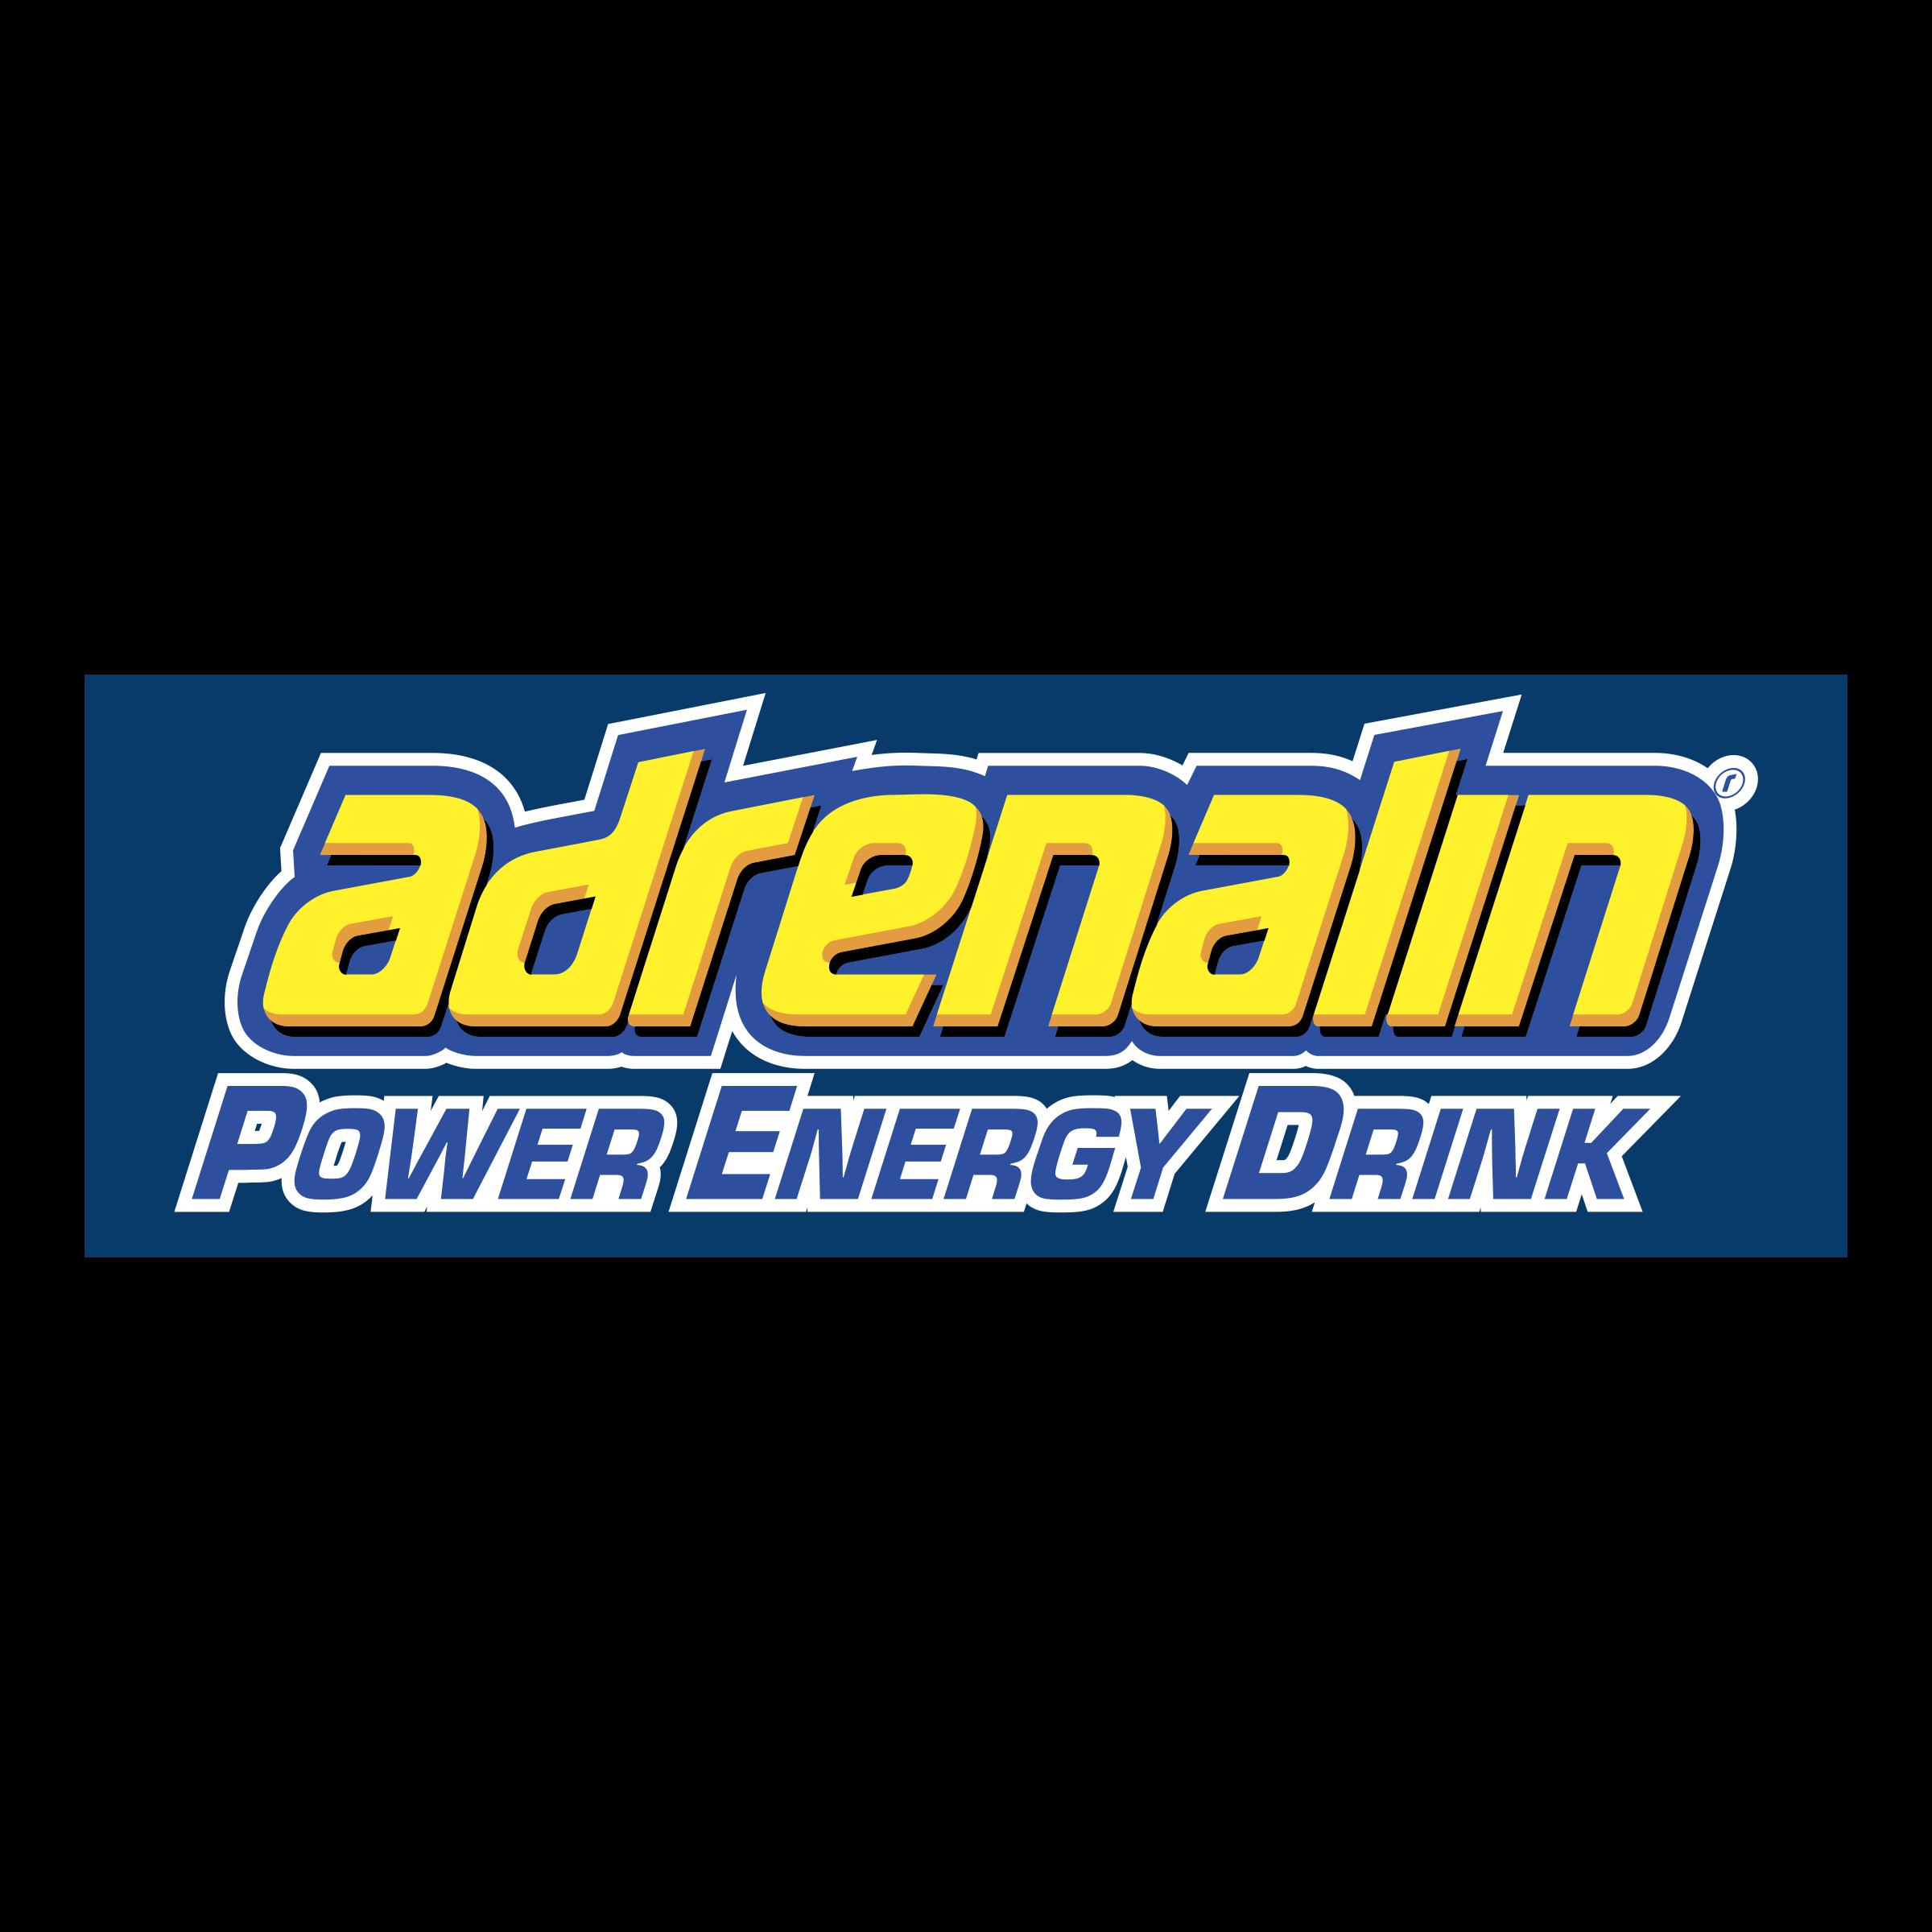 Adrenalin Power Energy Drink Logo PNG Transparent & SVG